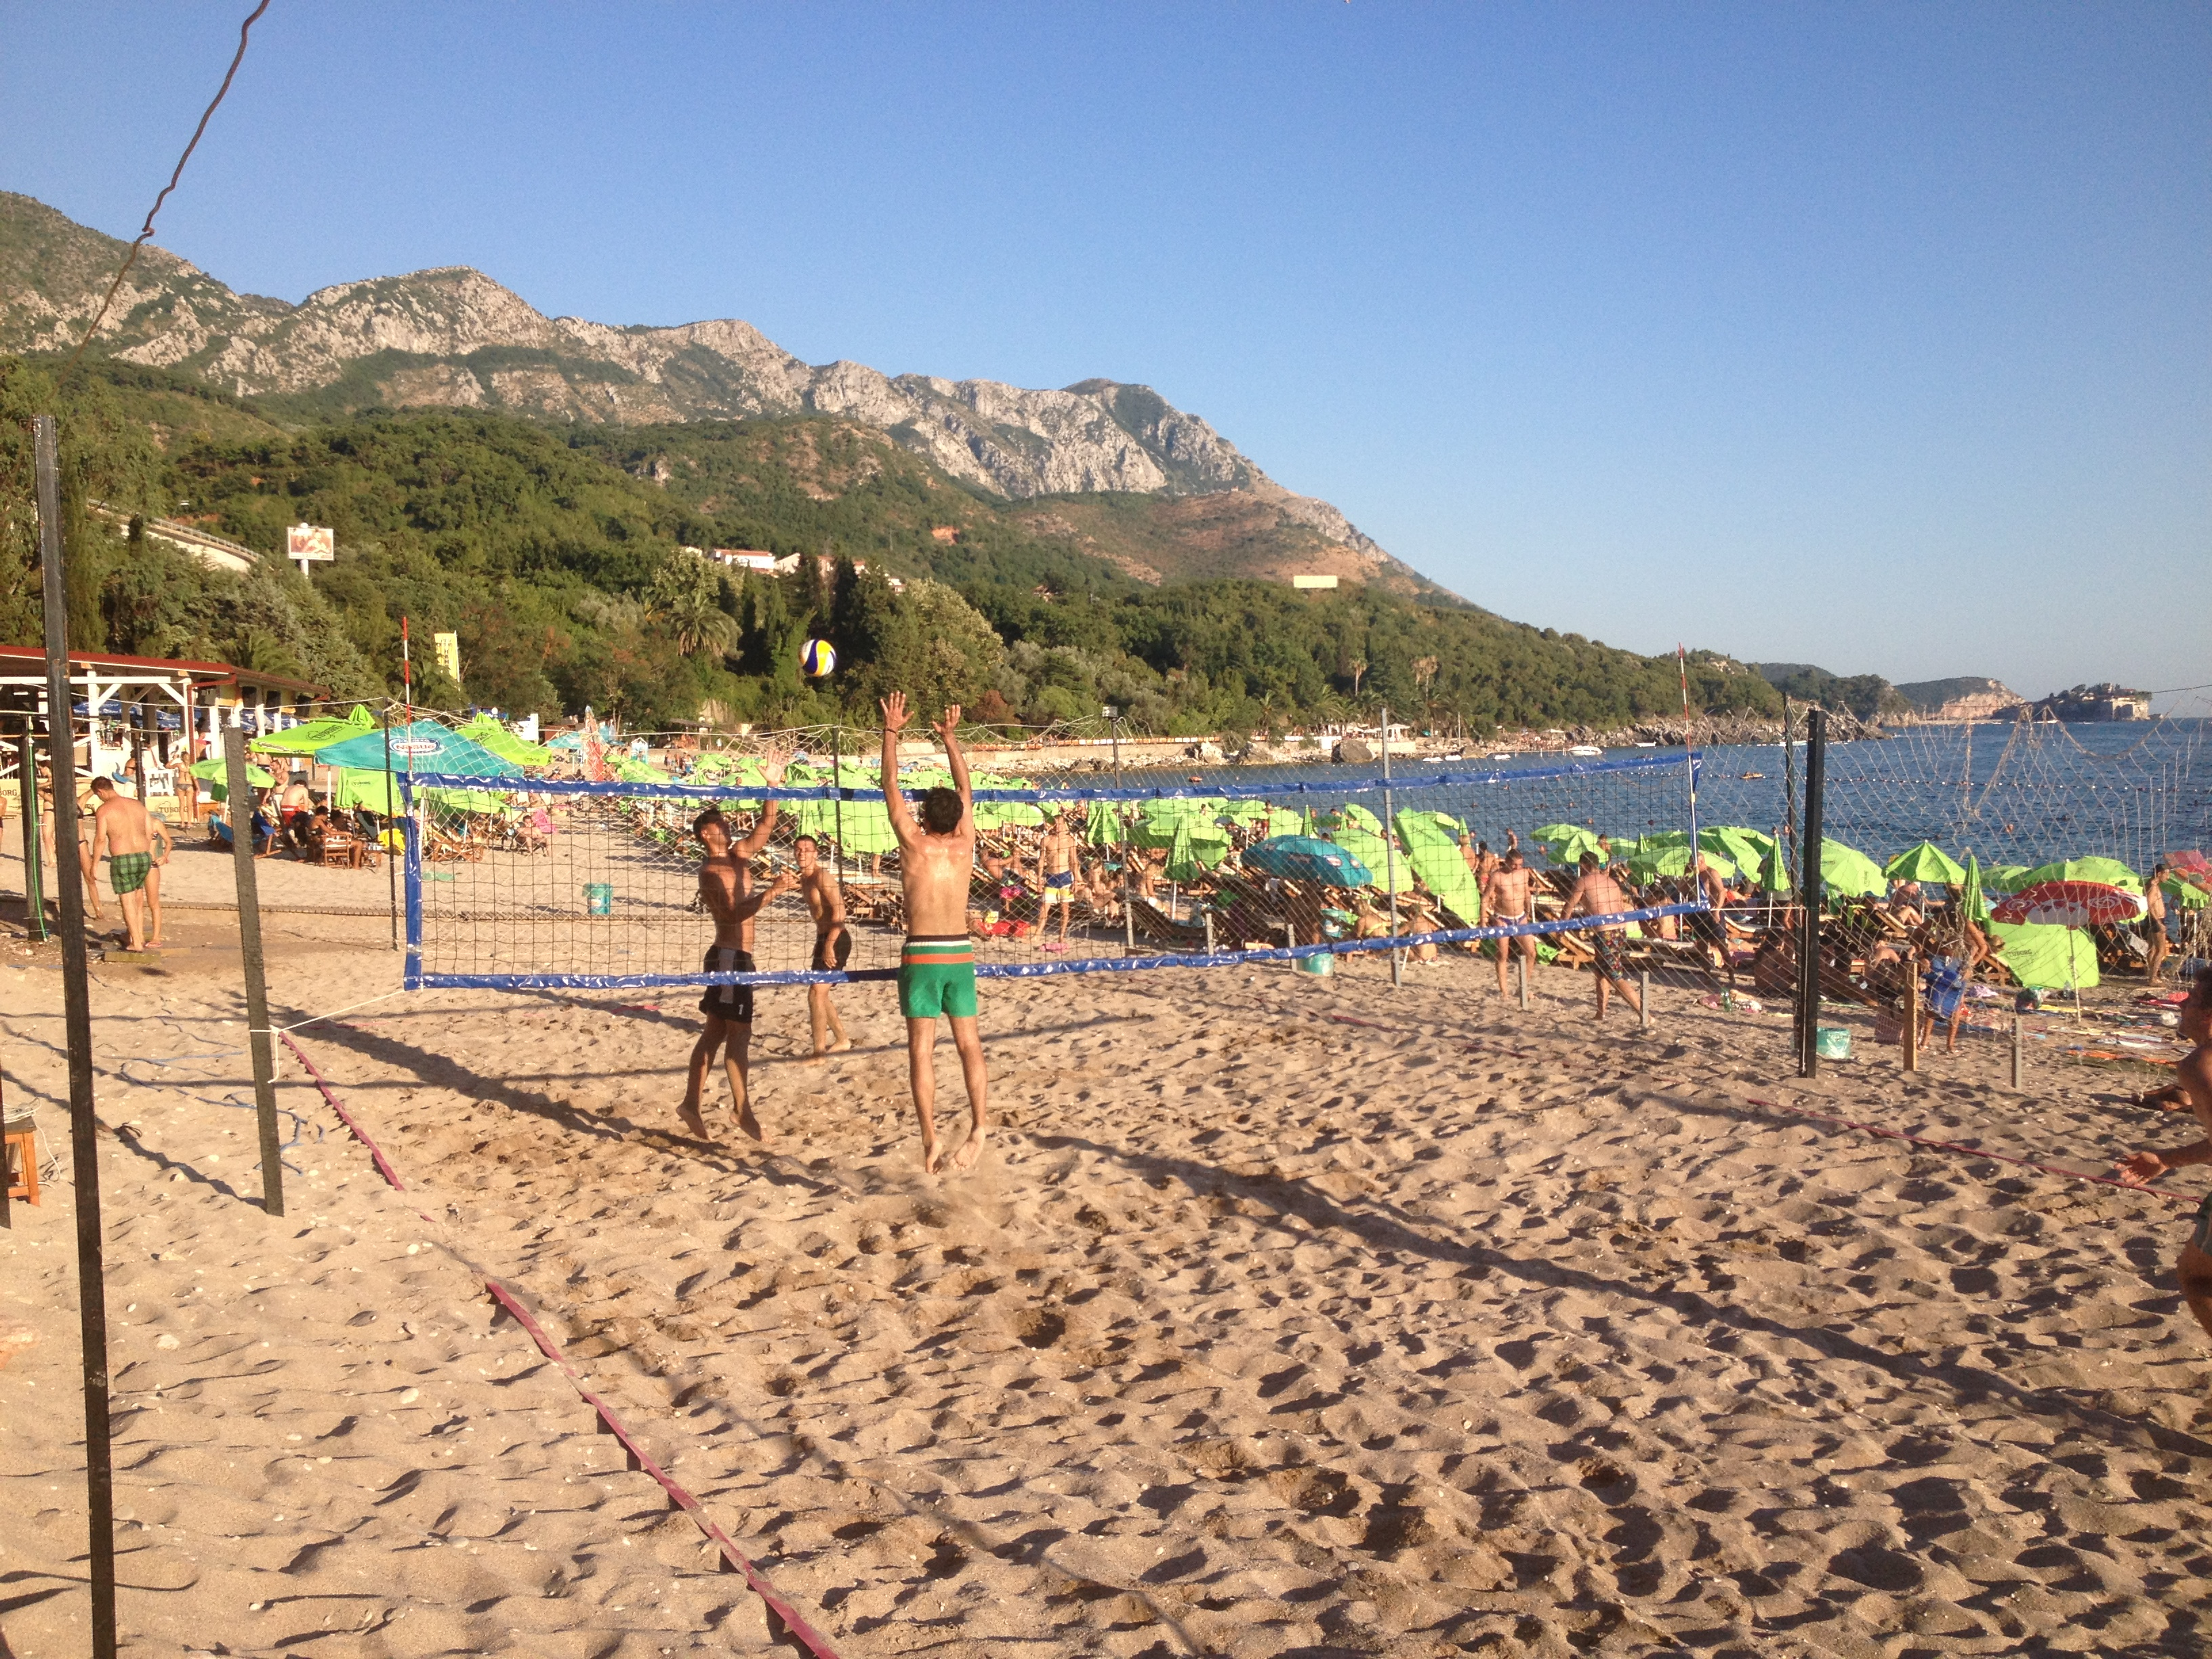 odbojka na pijesku kamenovo beach volley montenegro crna gora oscg expand the net